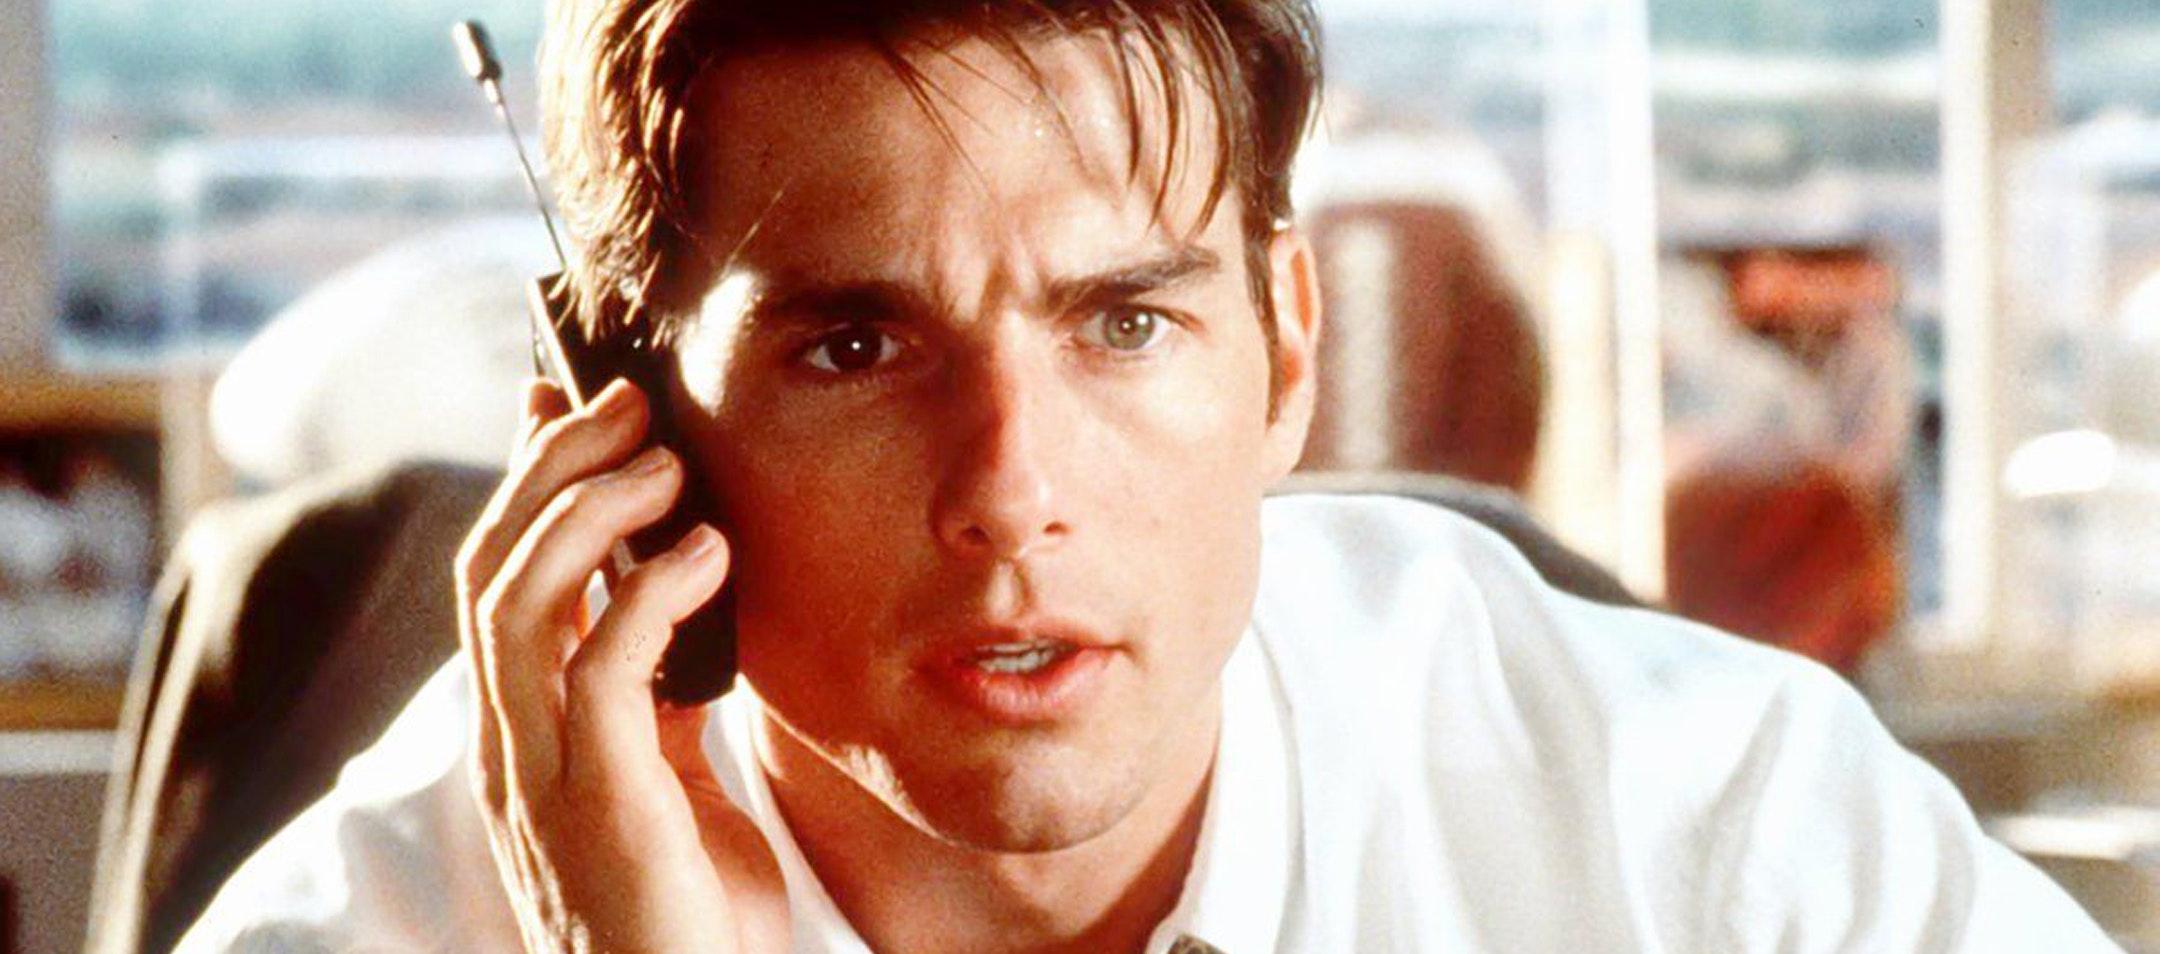 Jerry Maguire desktop